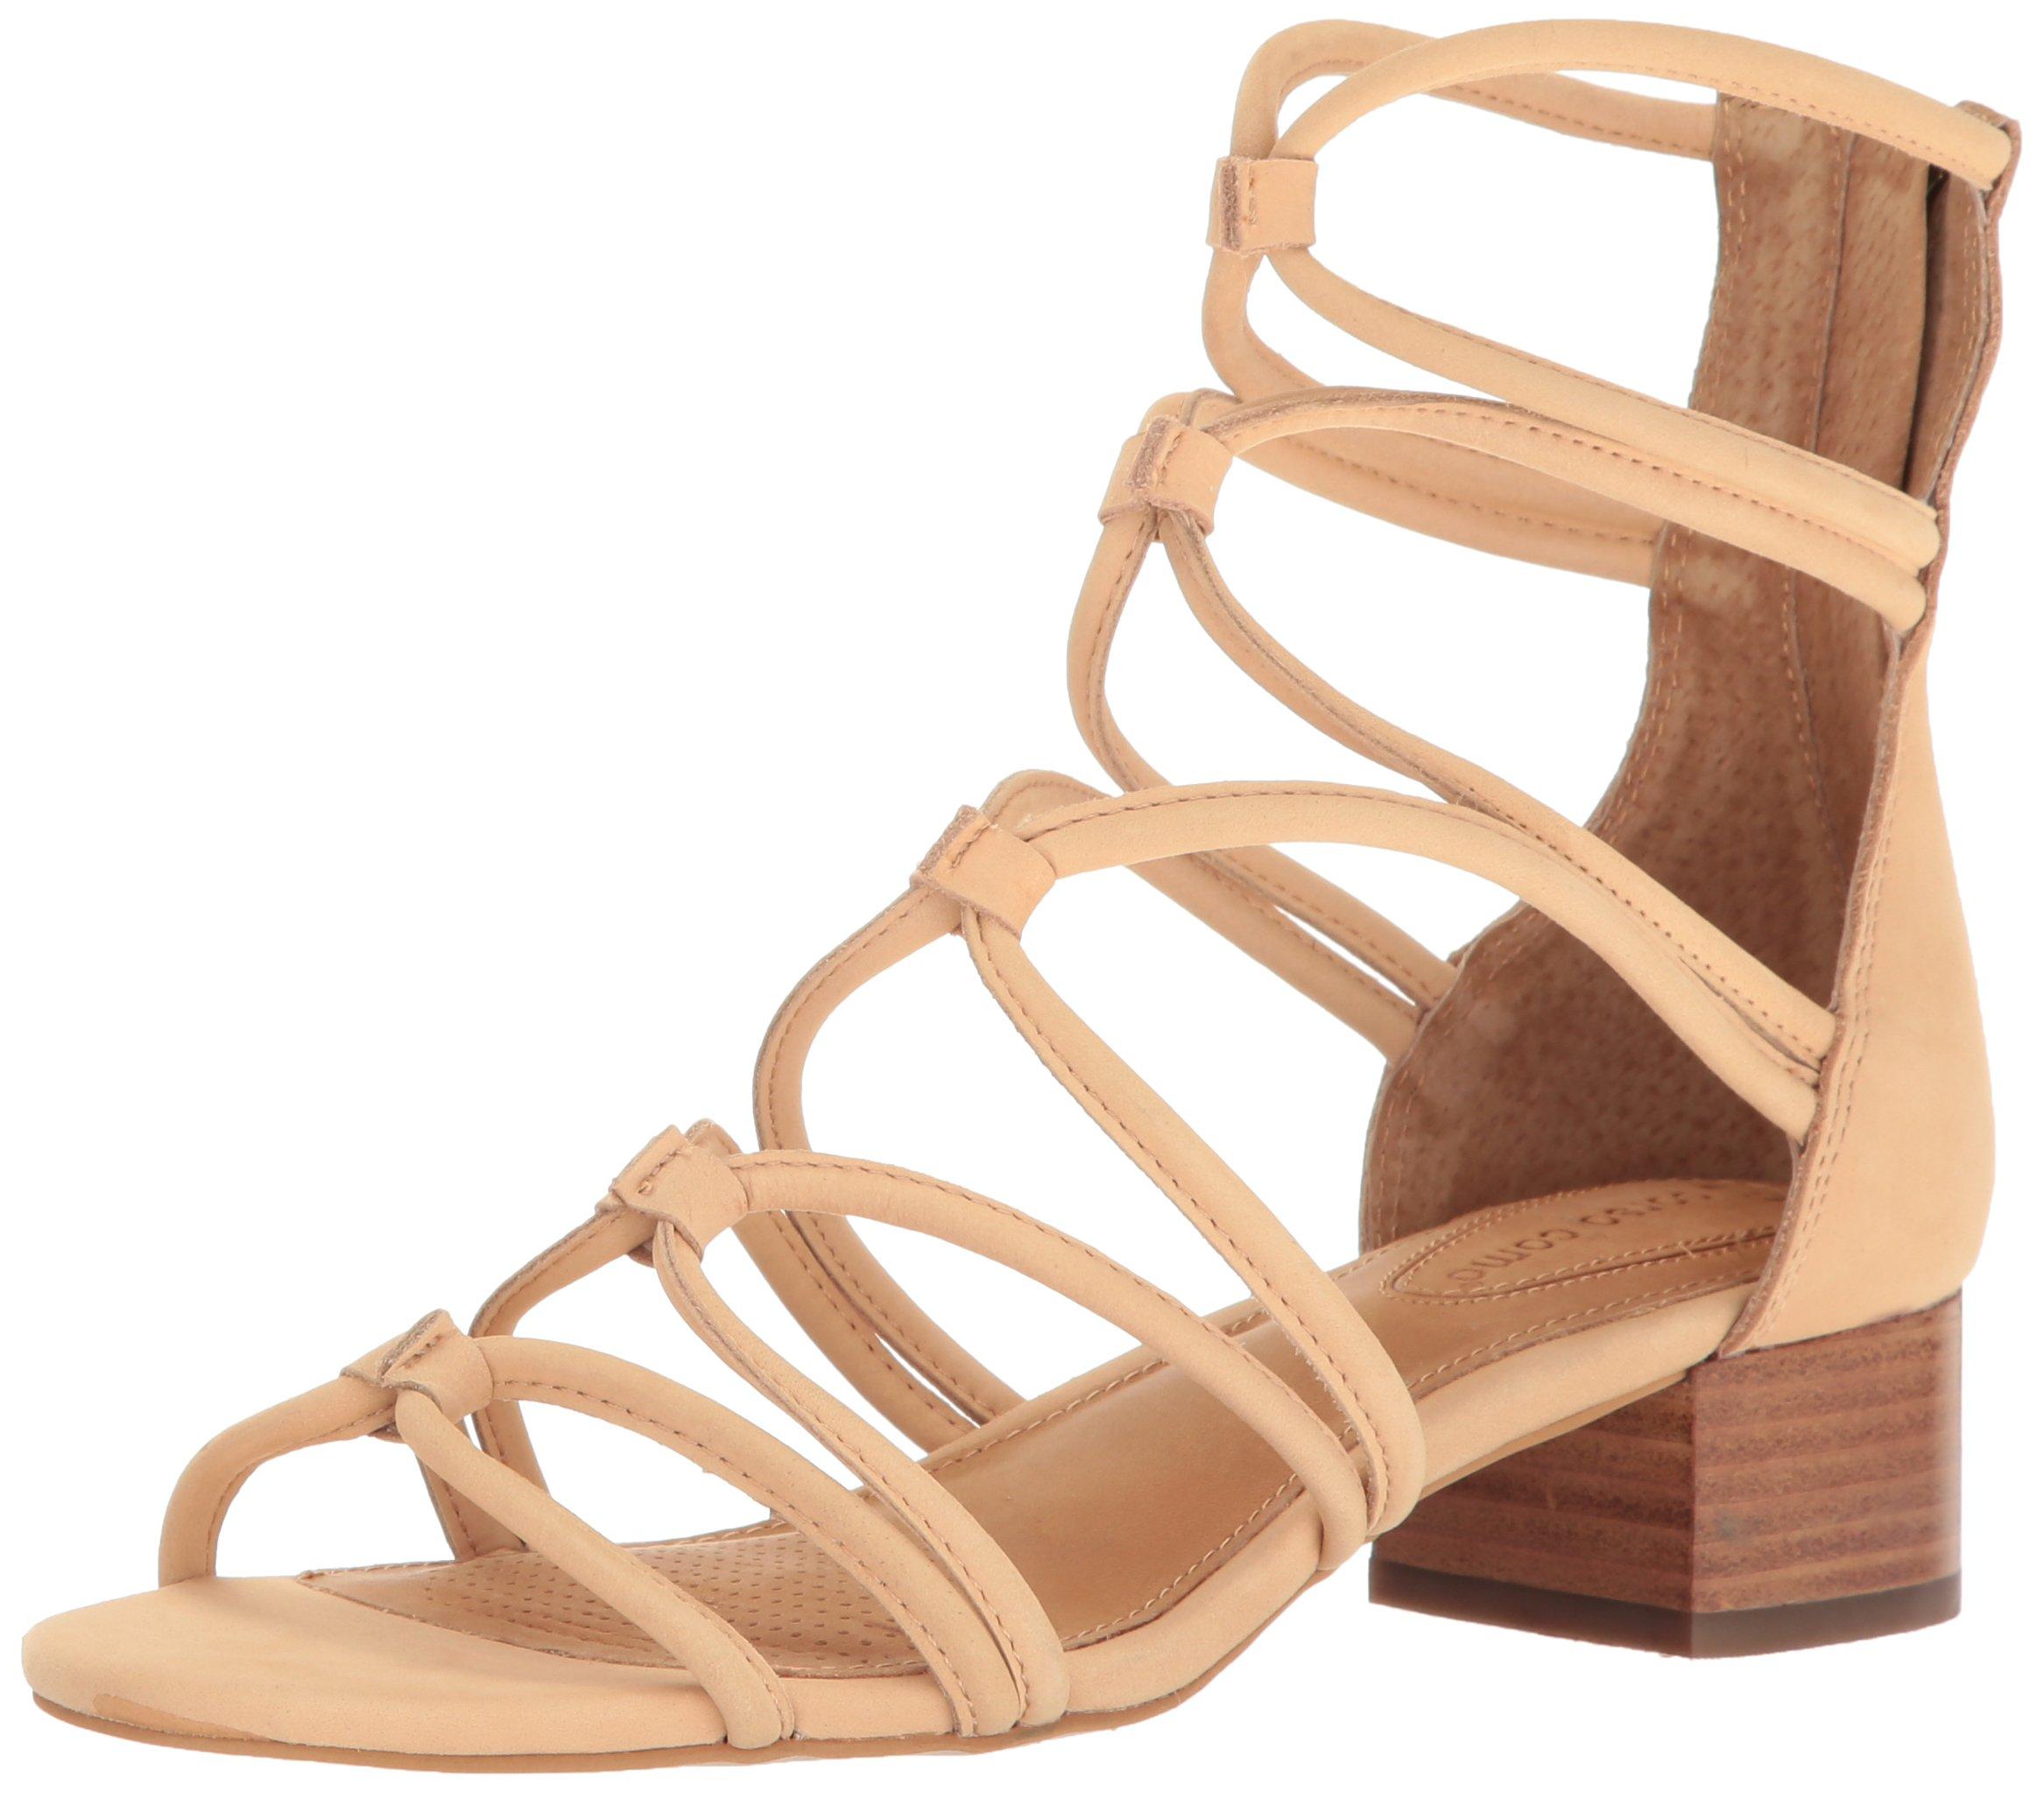 Corso Como Women's Jenkins Heeled Sandal, Nude Nubuck, 7 US/7 M US